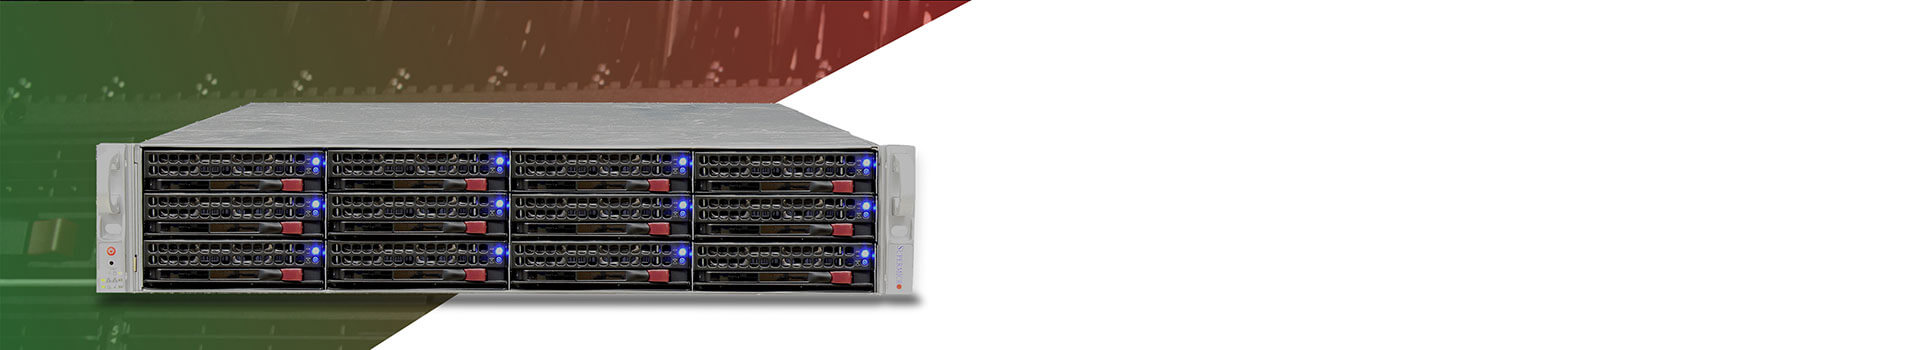 Supermicro Server CSE-829U